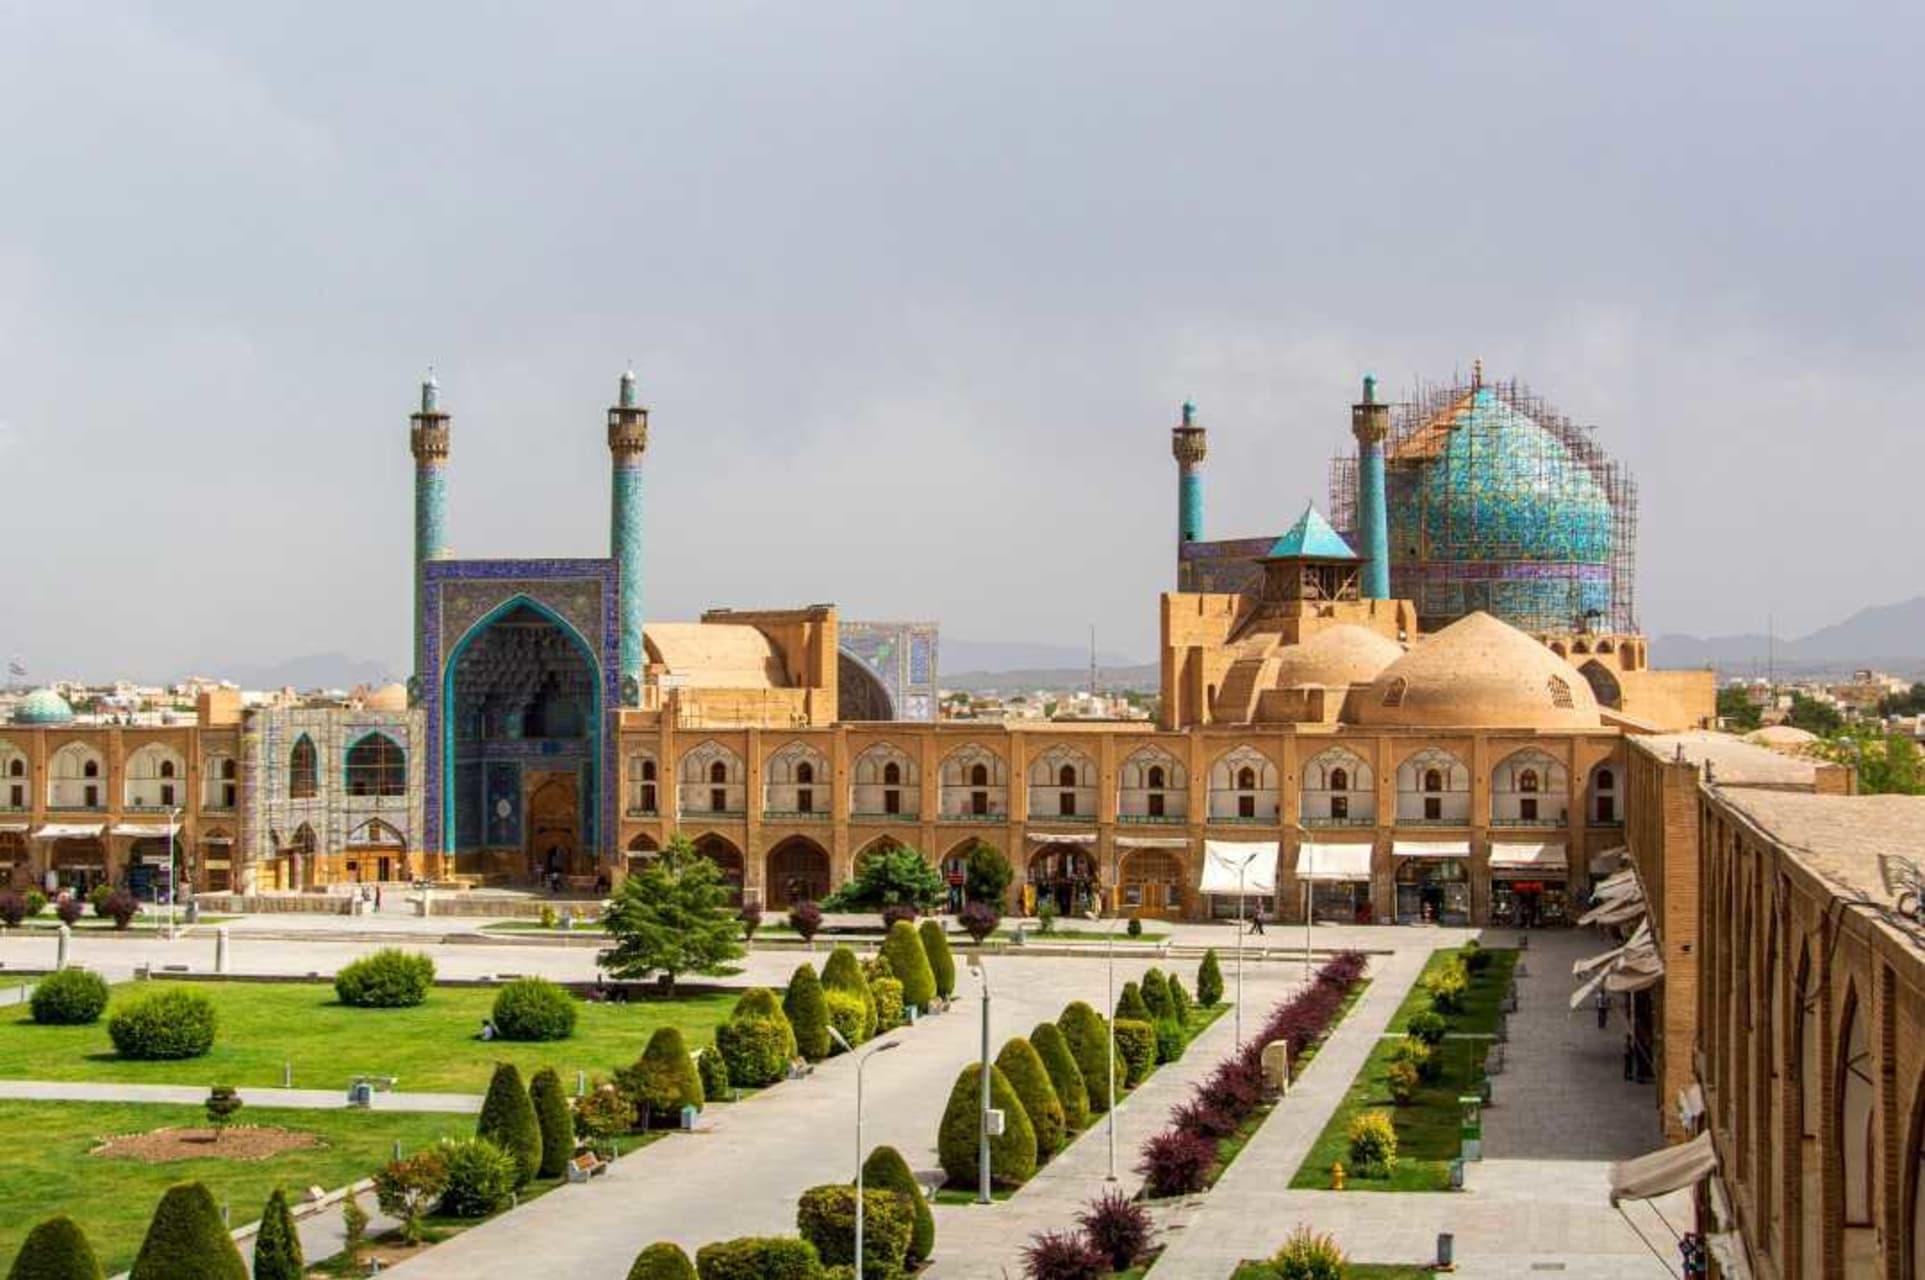 Ispahan - Naghsh E Jahan Square Part I